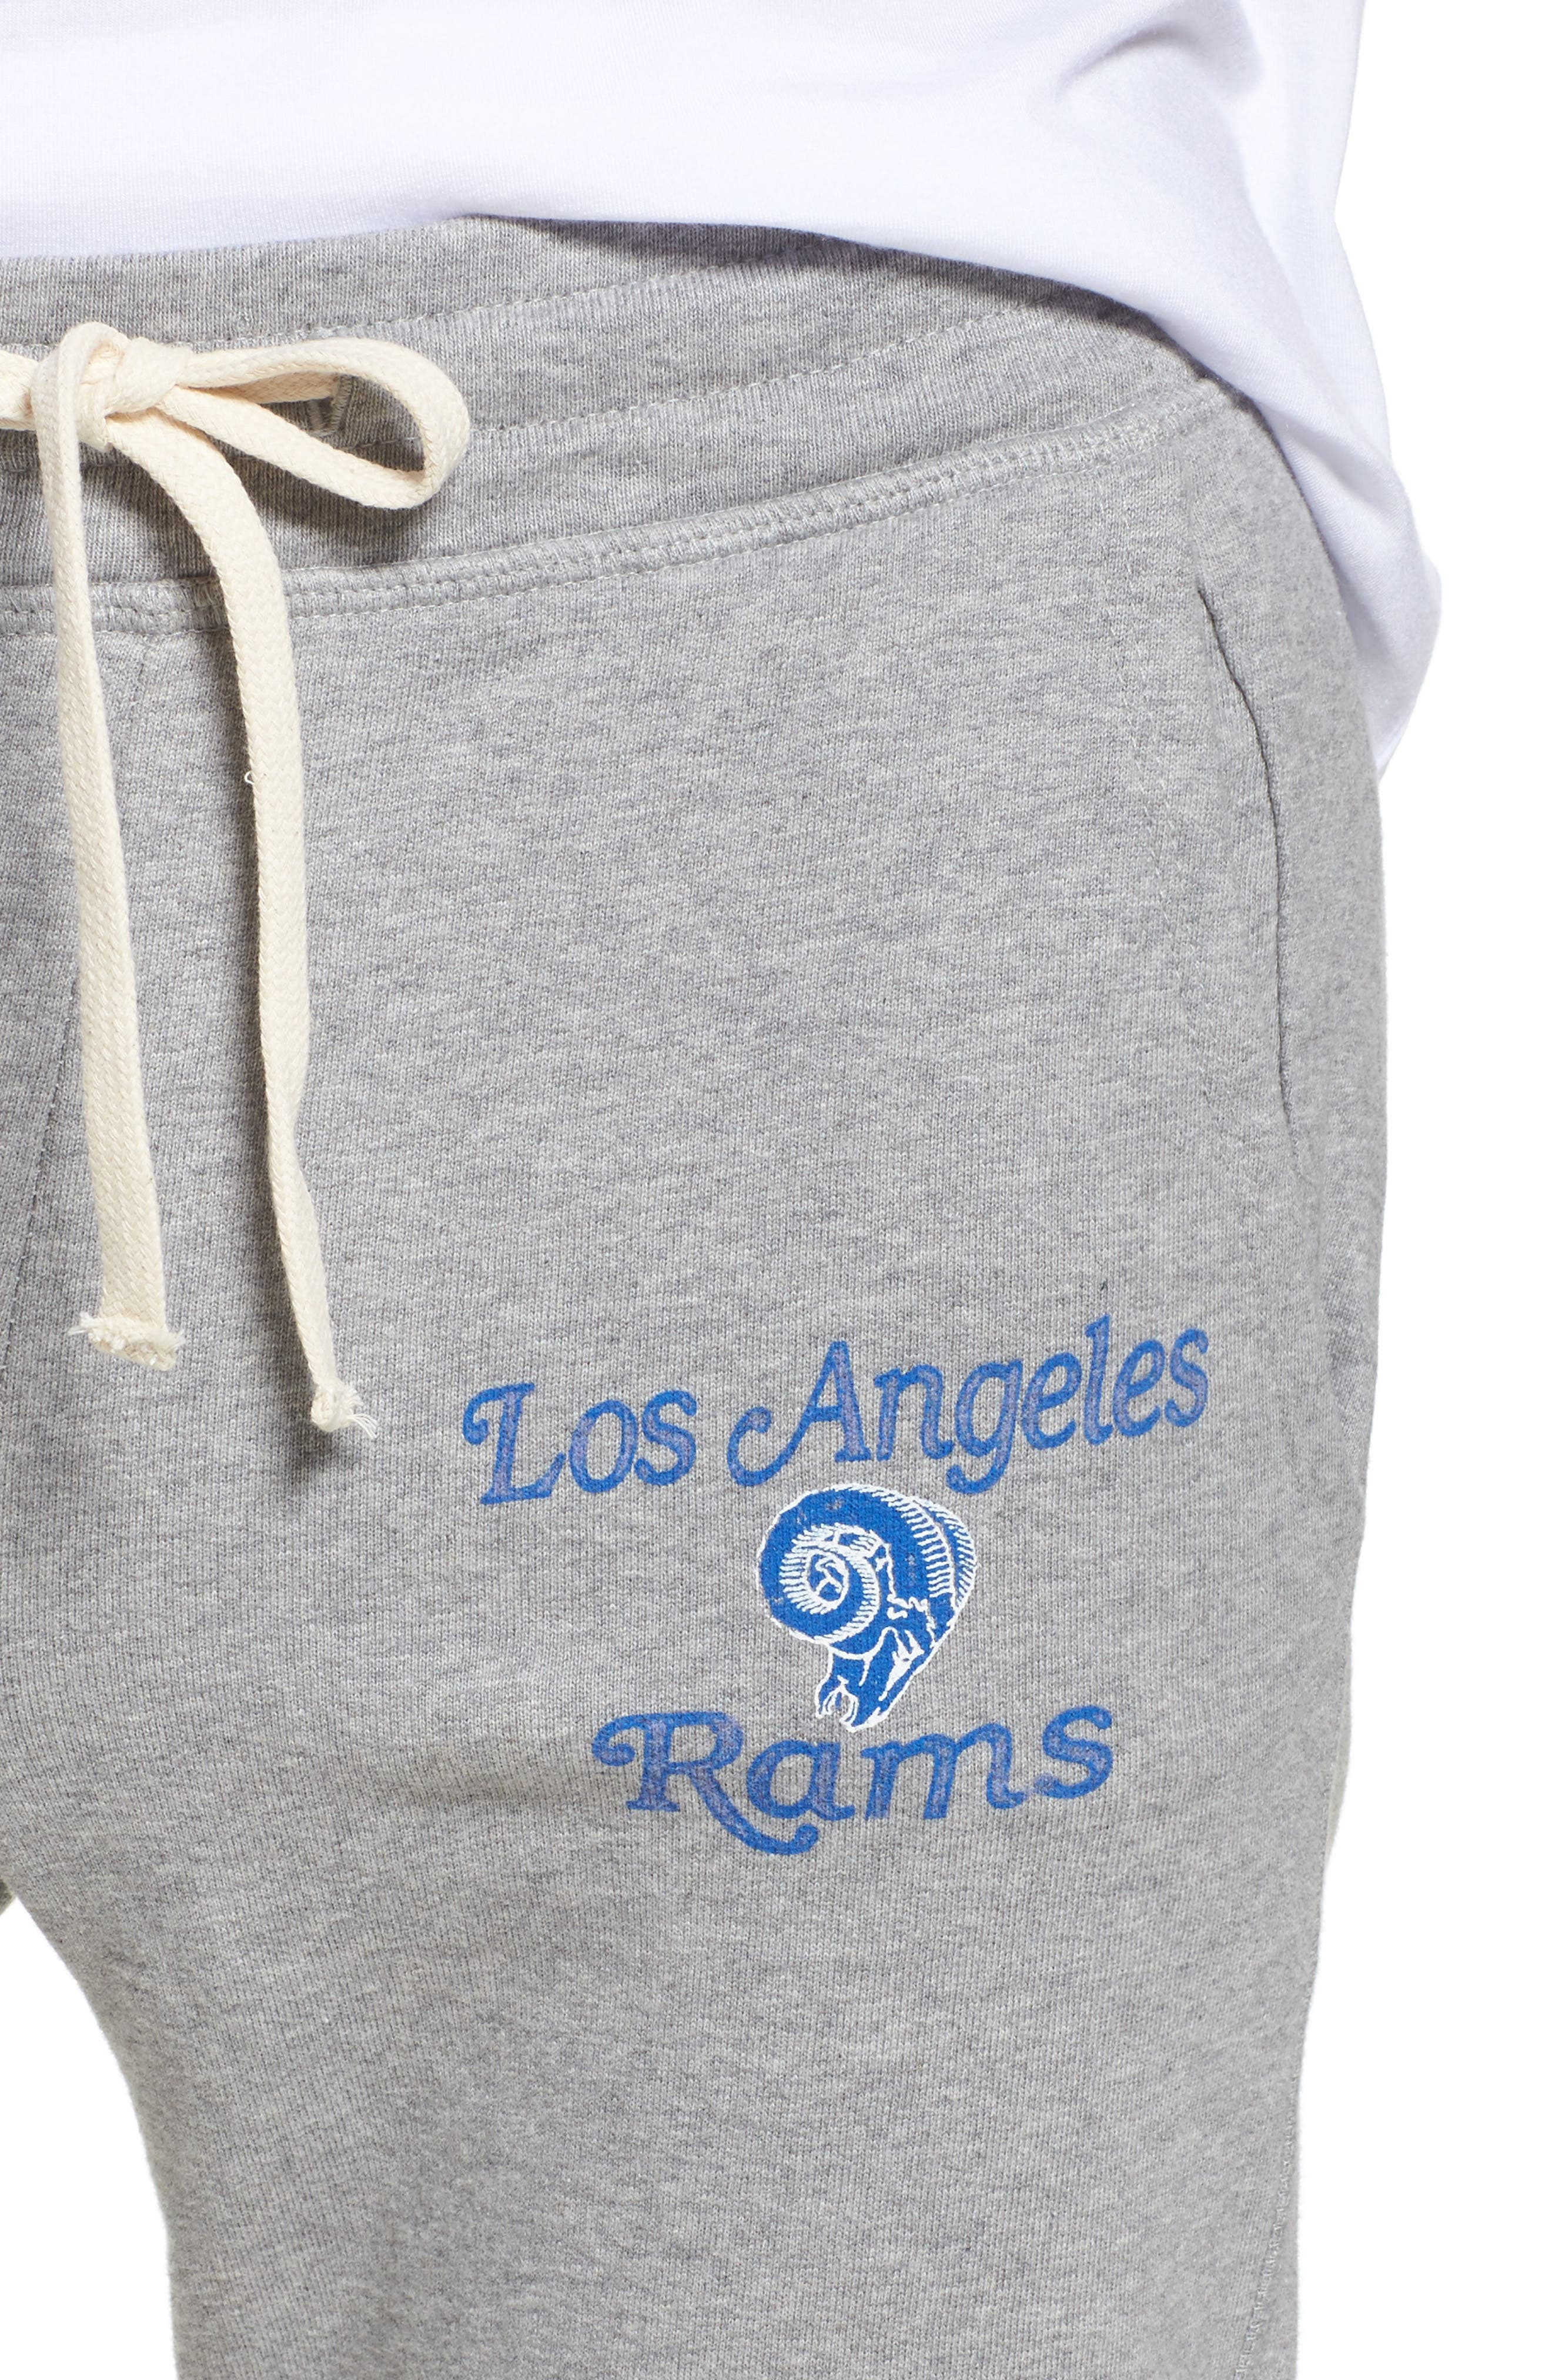 NFL Los Angeles Rams Sunday Sweatpants,                             Alternate thumbnail 4, color,                             028